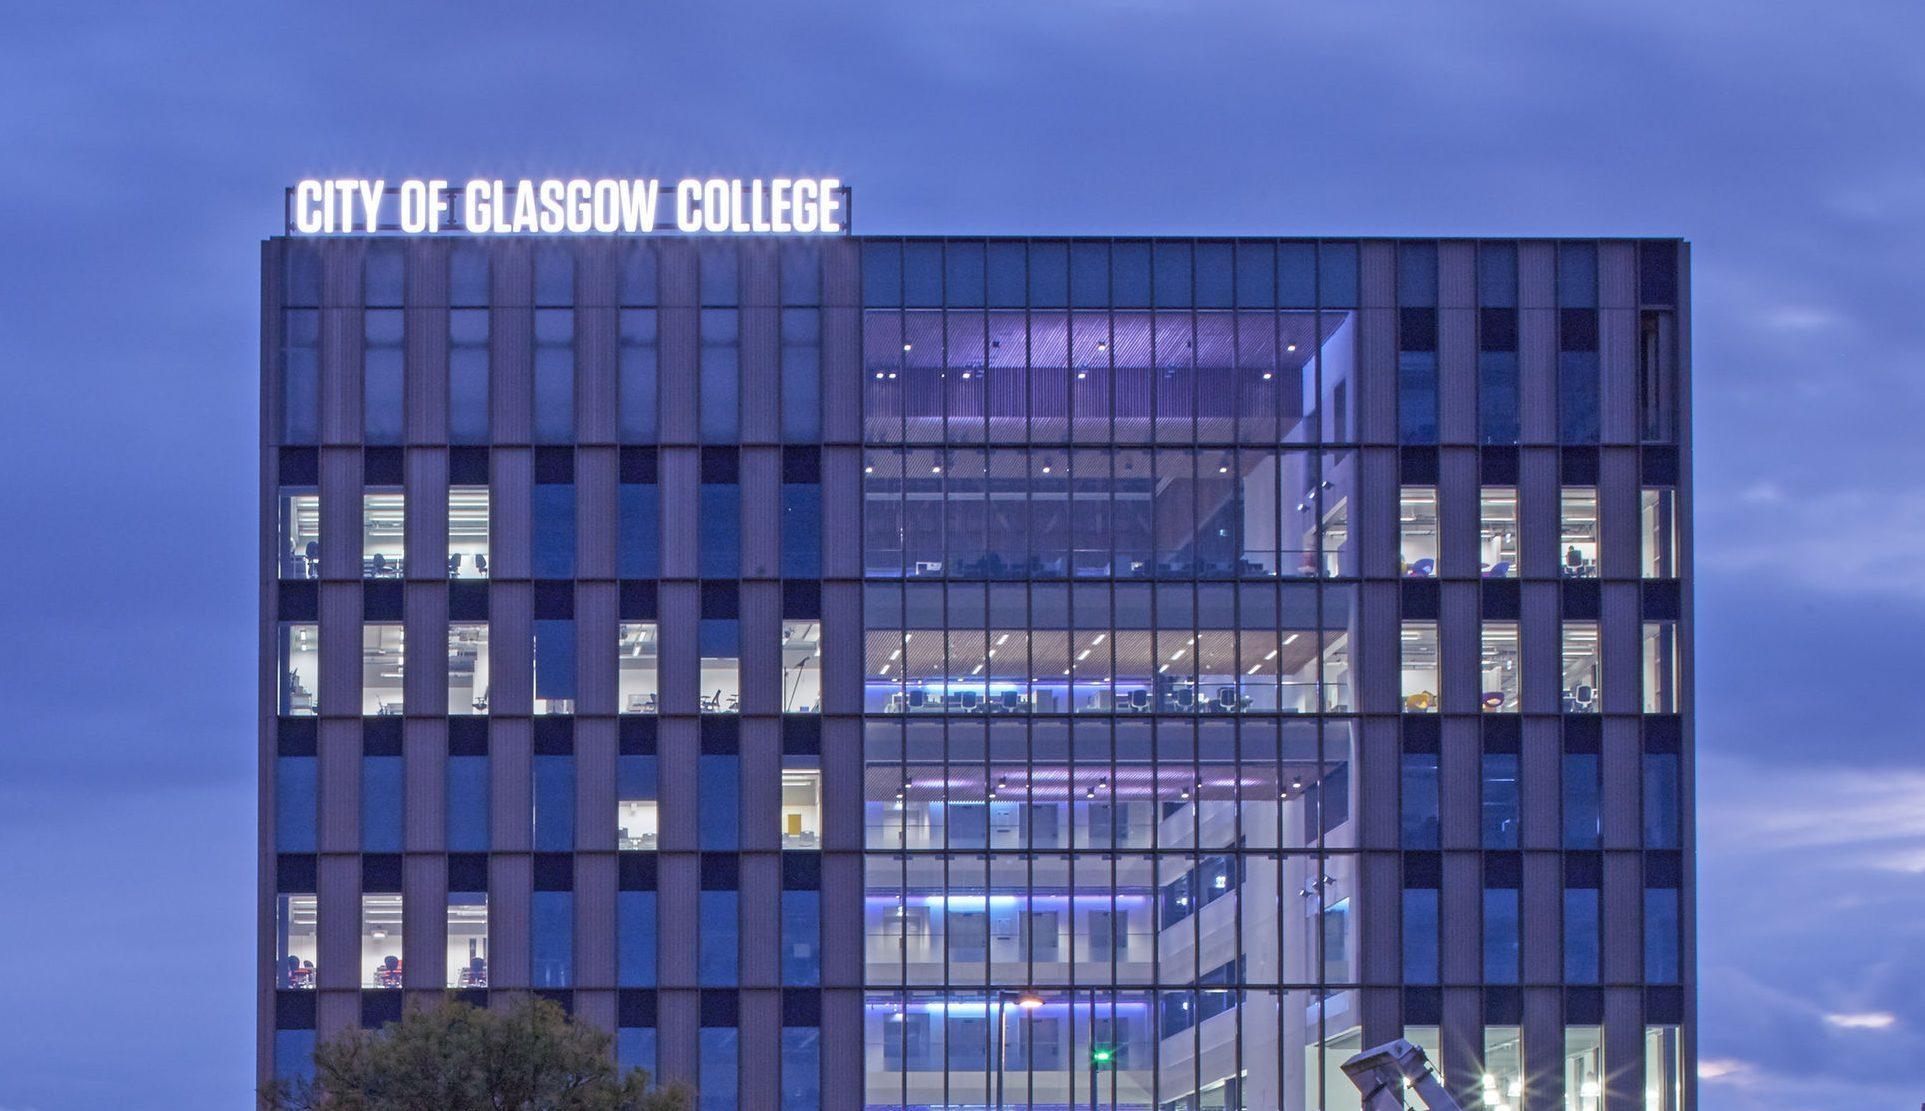 City of Glasgow College (Edmund Sumner/Riiba/PA Wire)